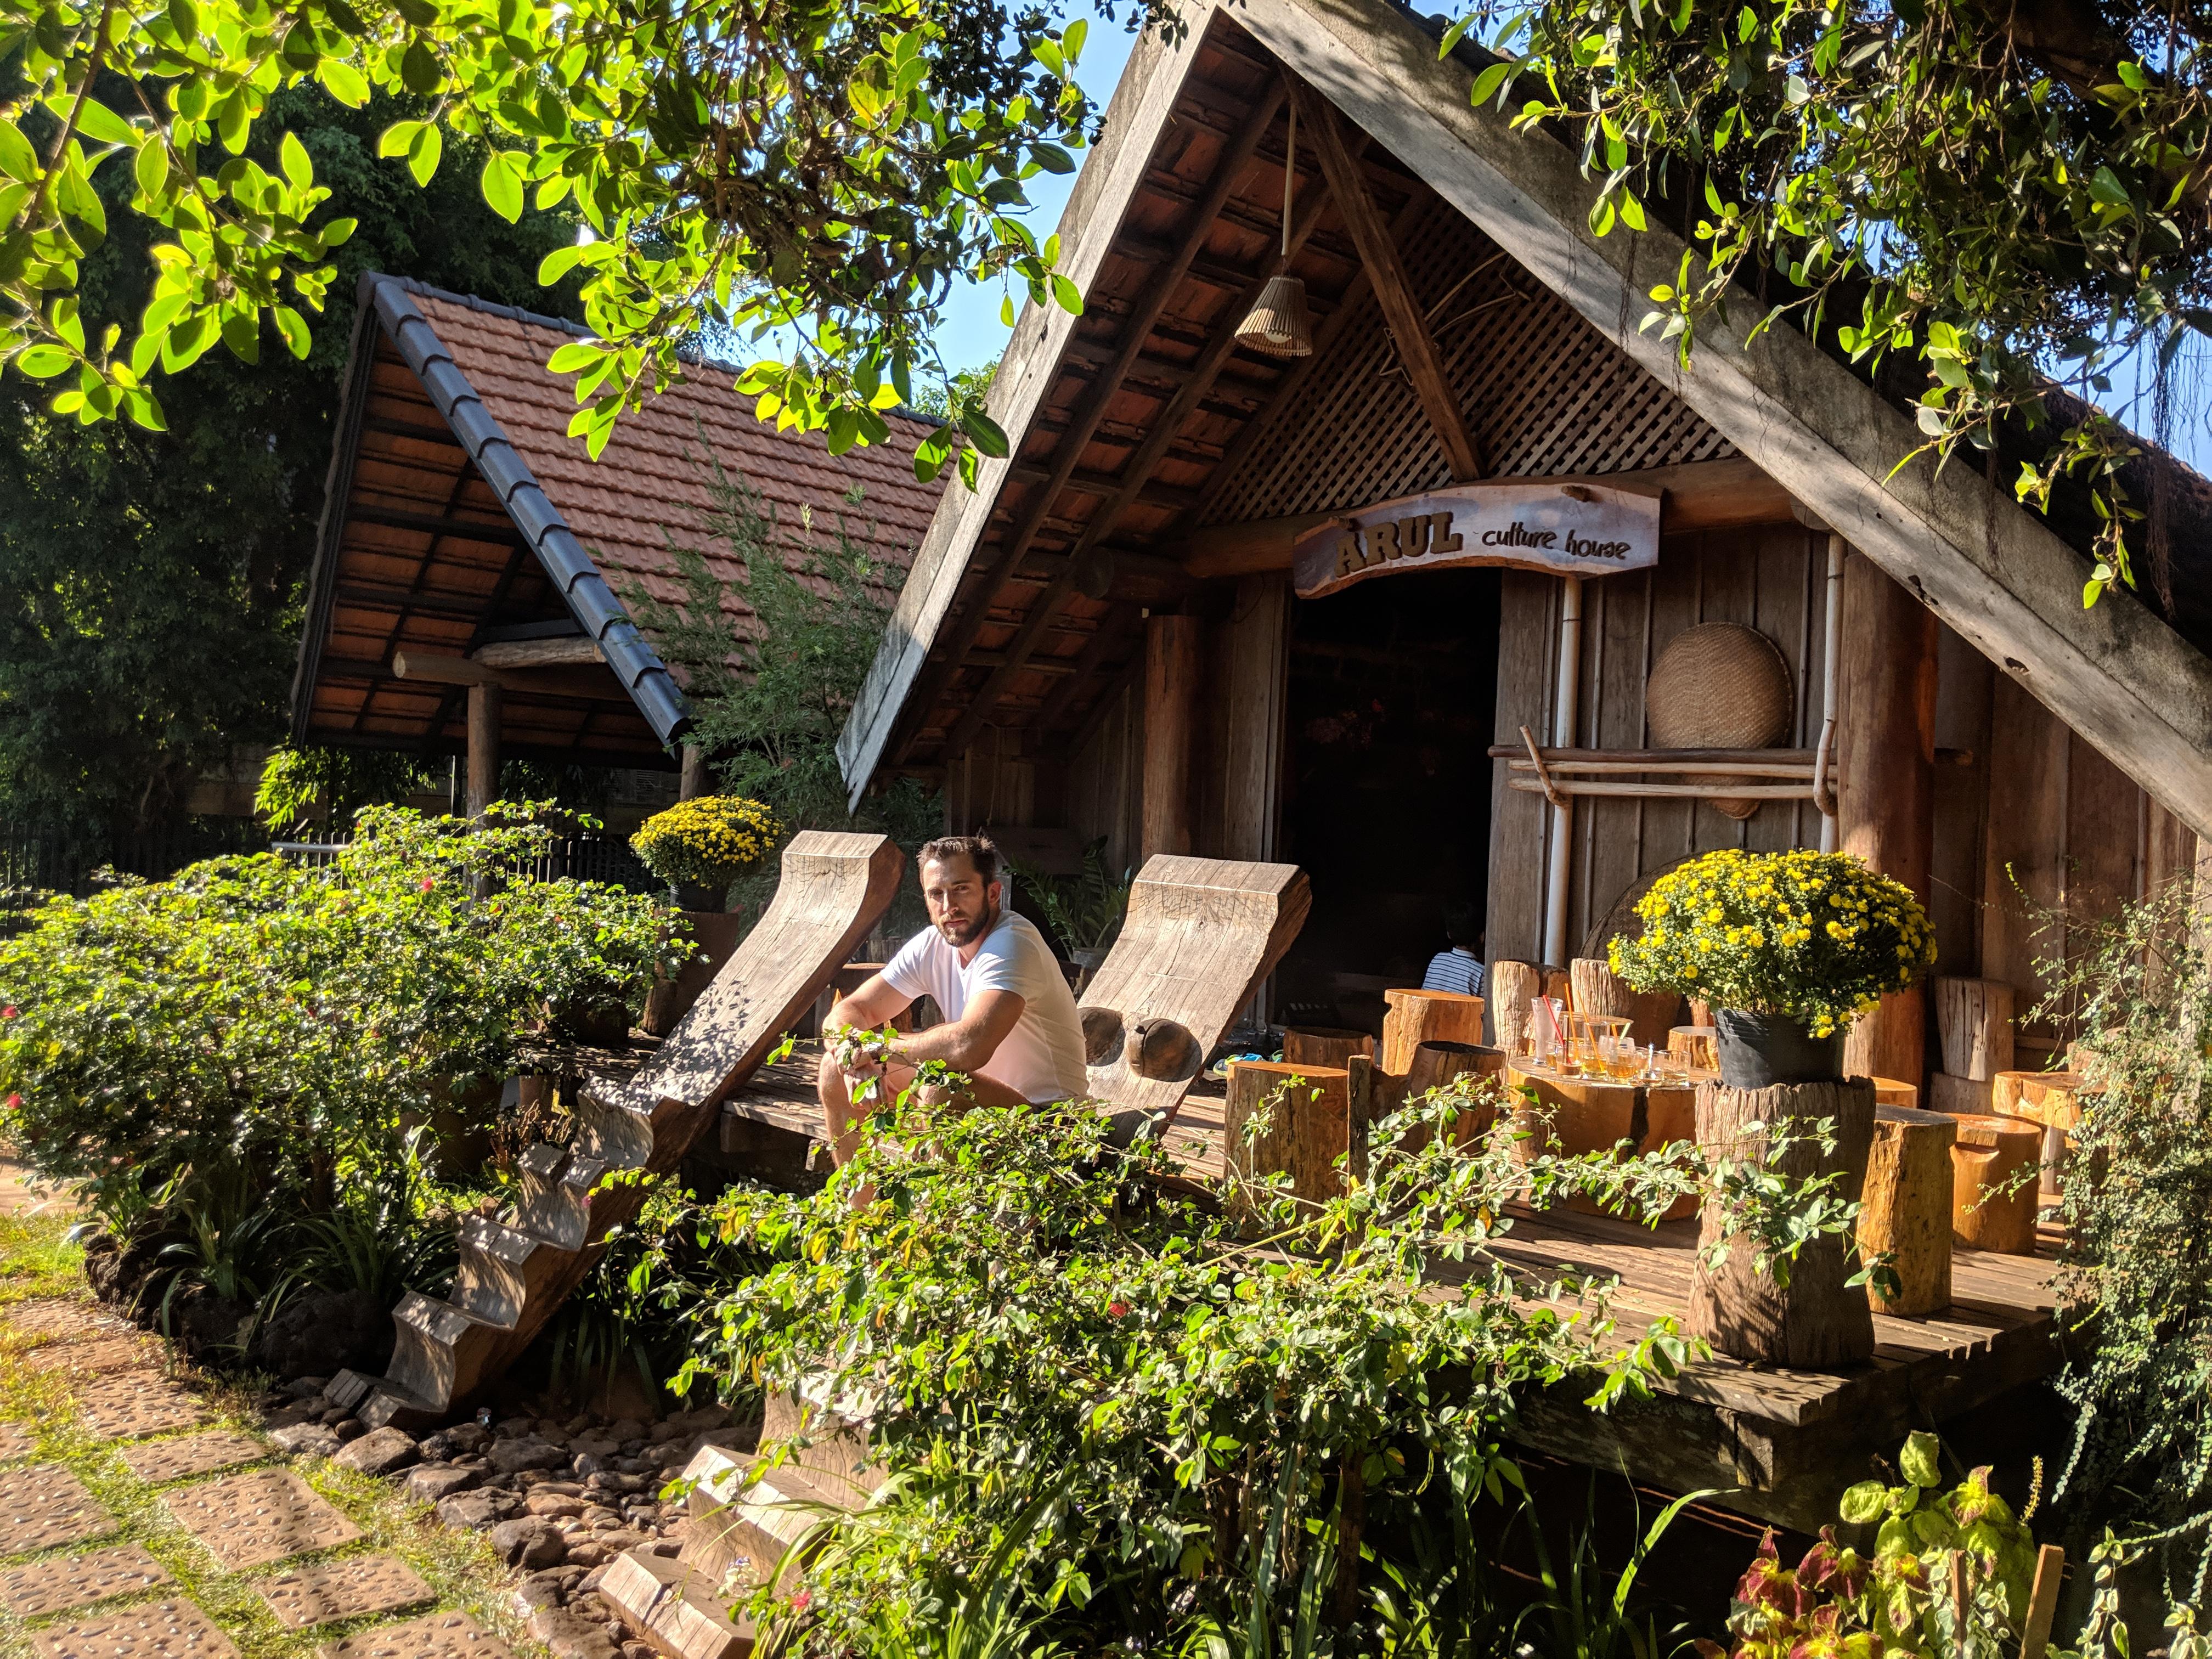 bun ma thuot vietnam digital nomad